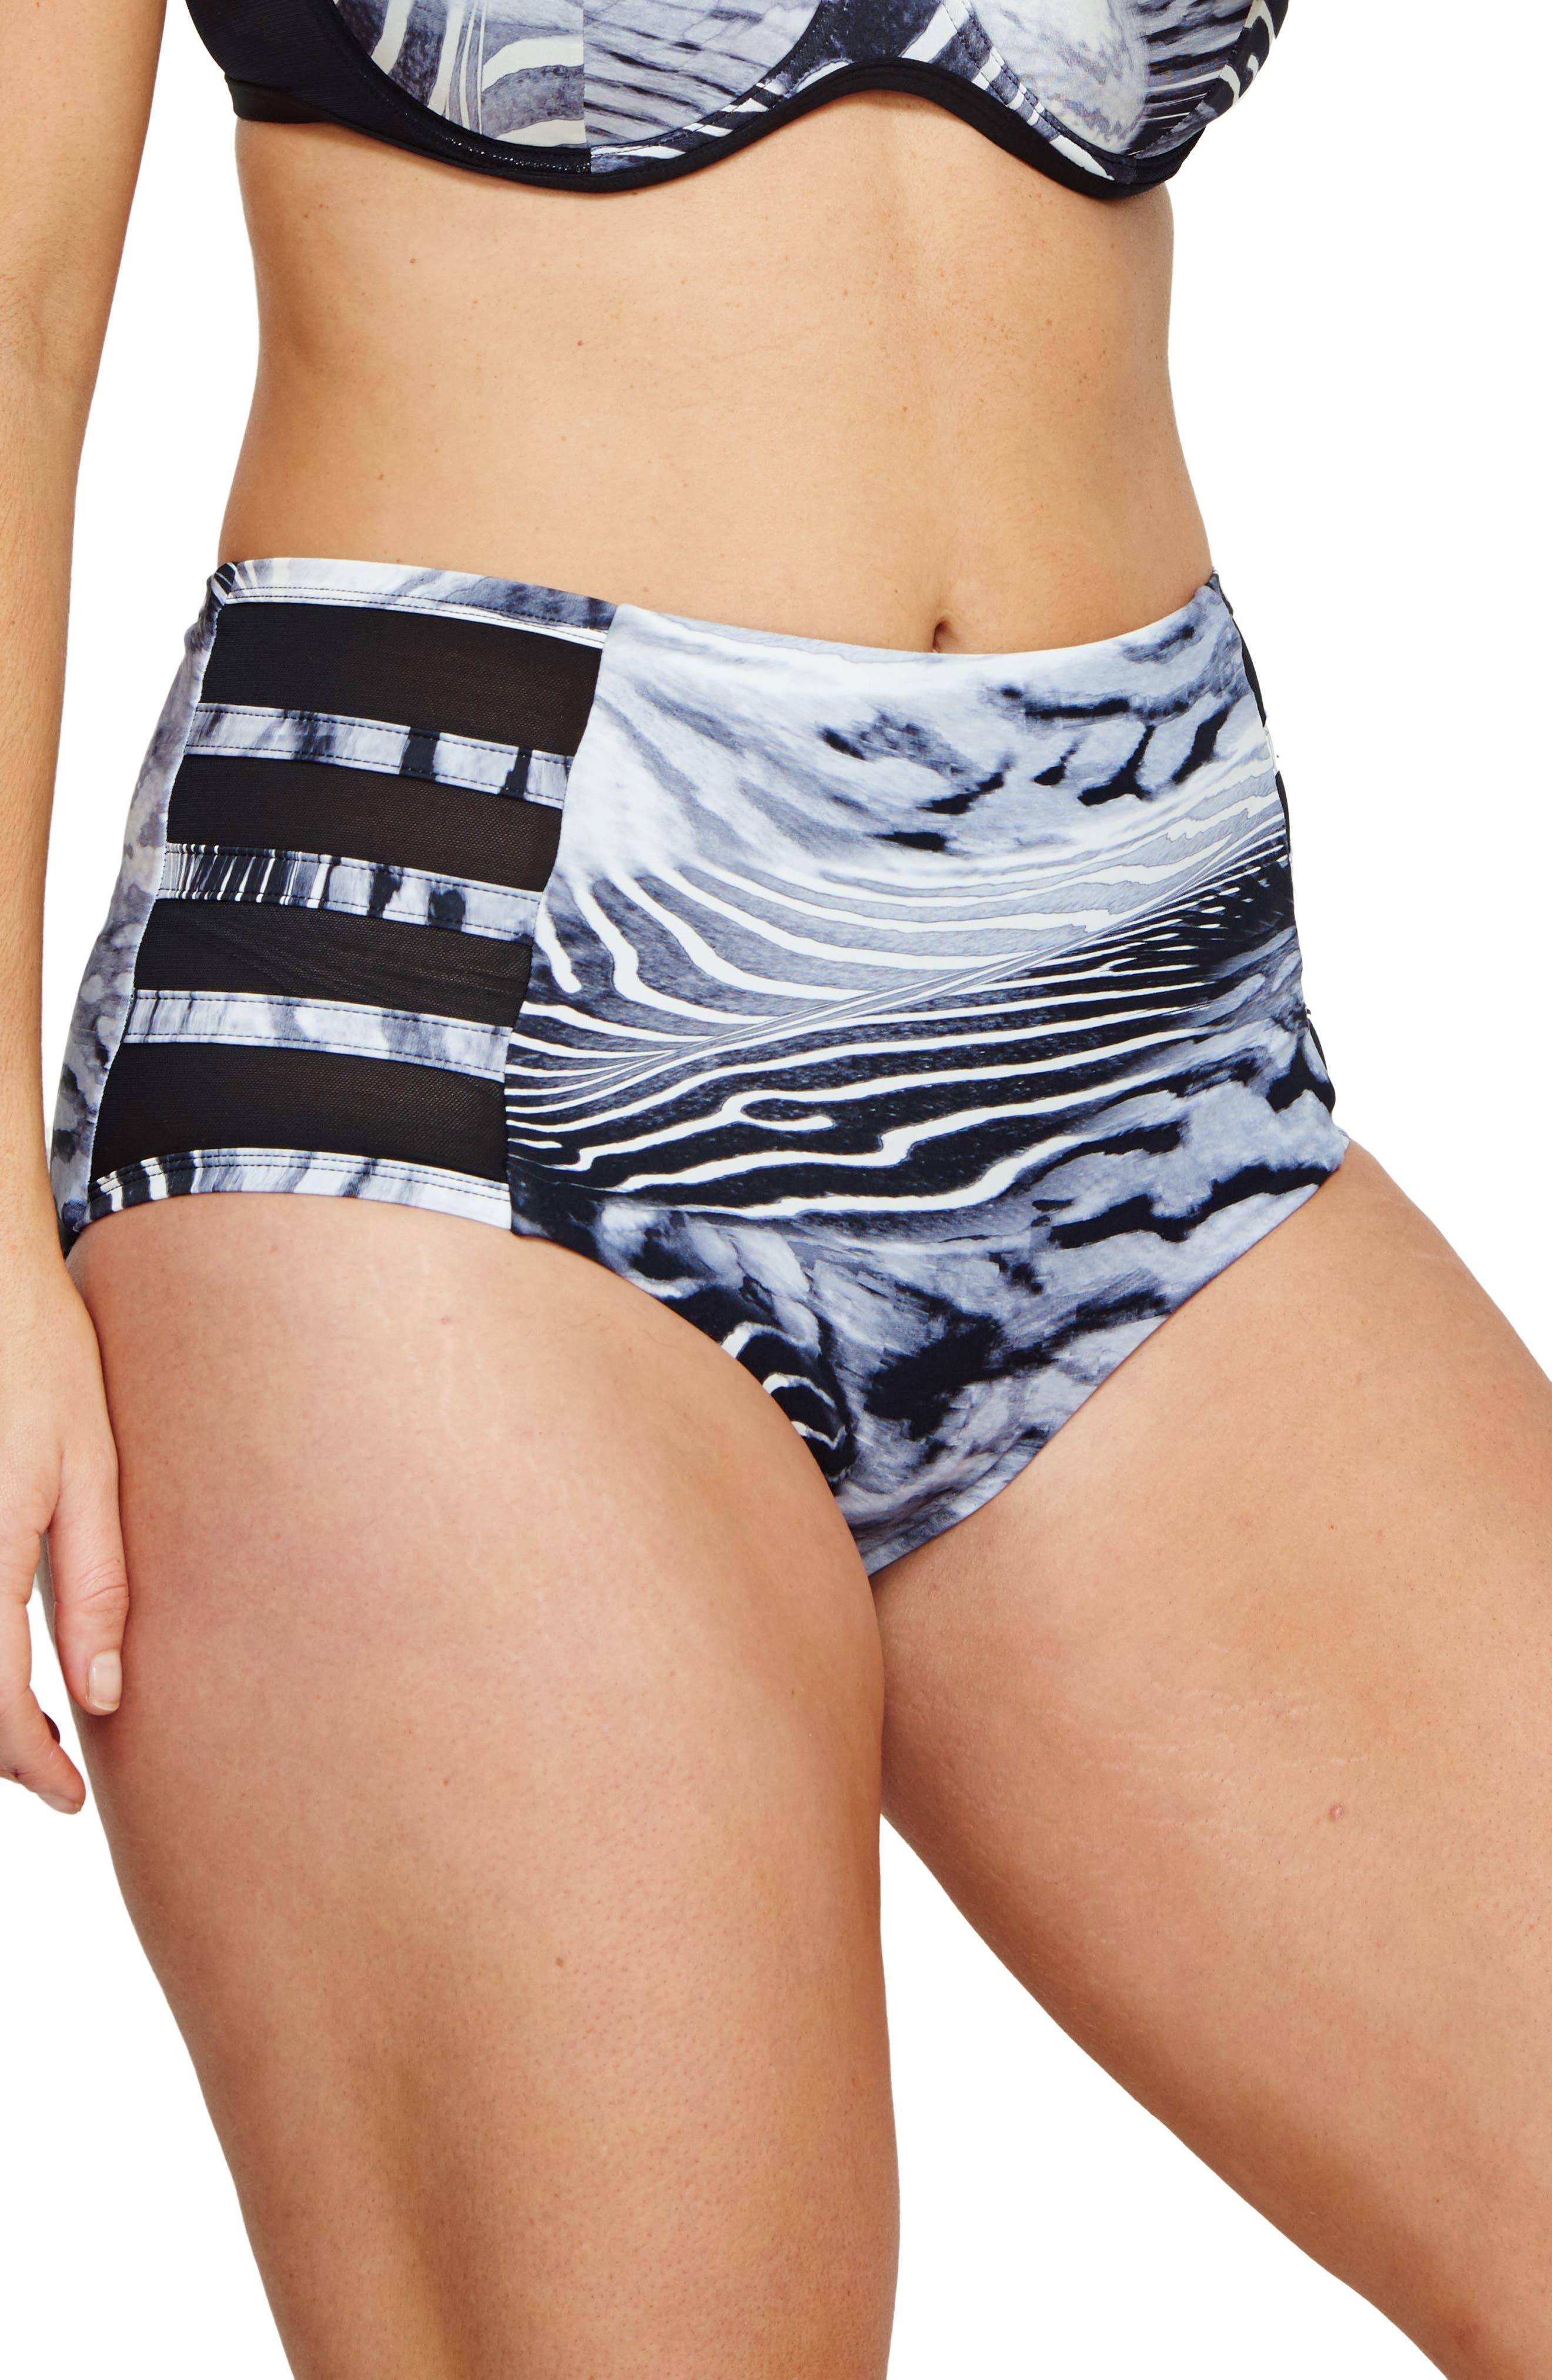 ROBYN LAWLEY Lucia High Waist Bikini Bottoms